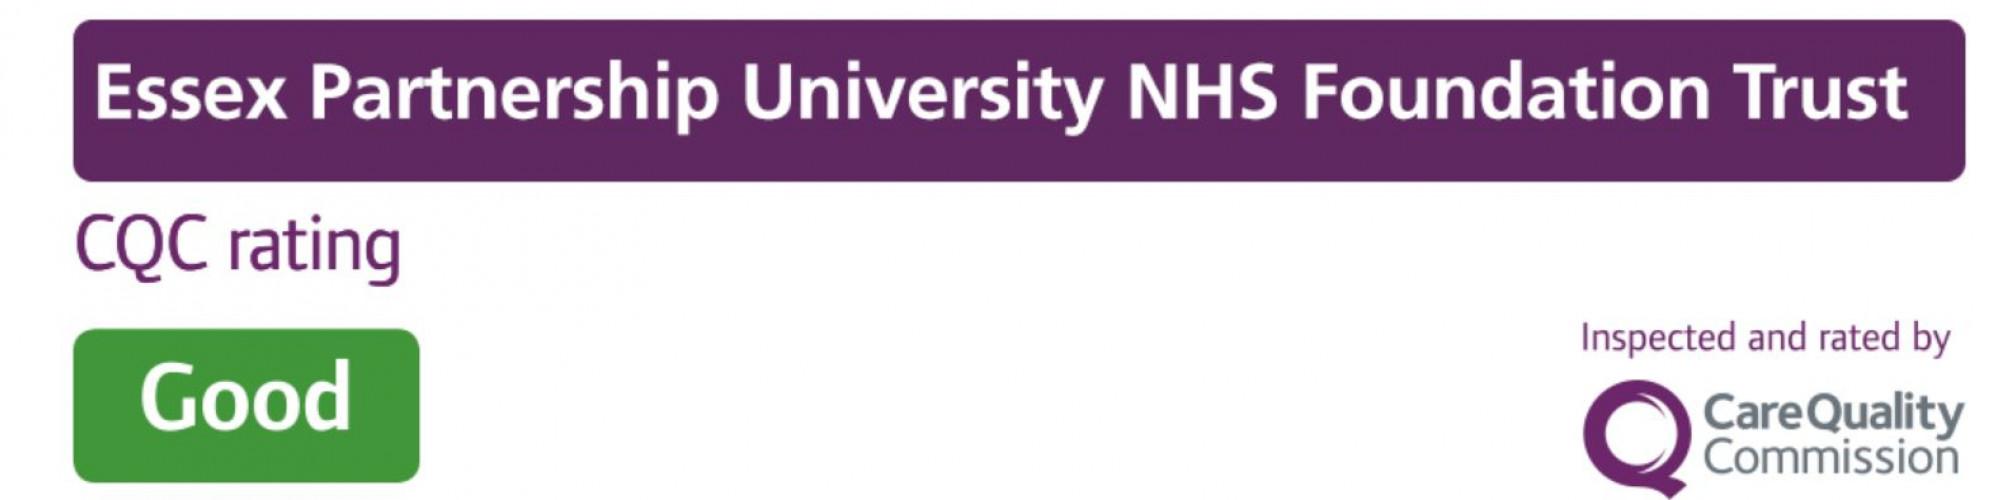 Essex Partnership University NHS